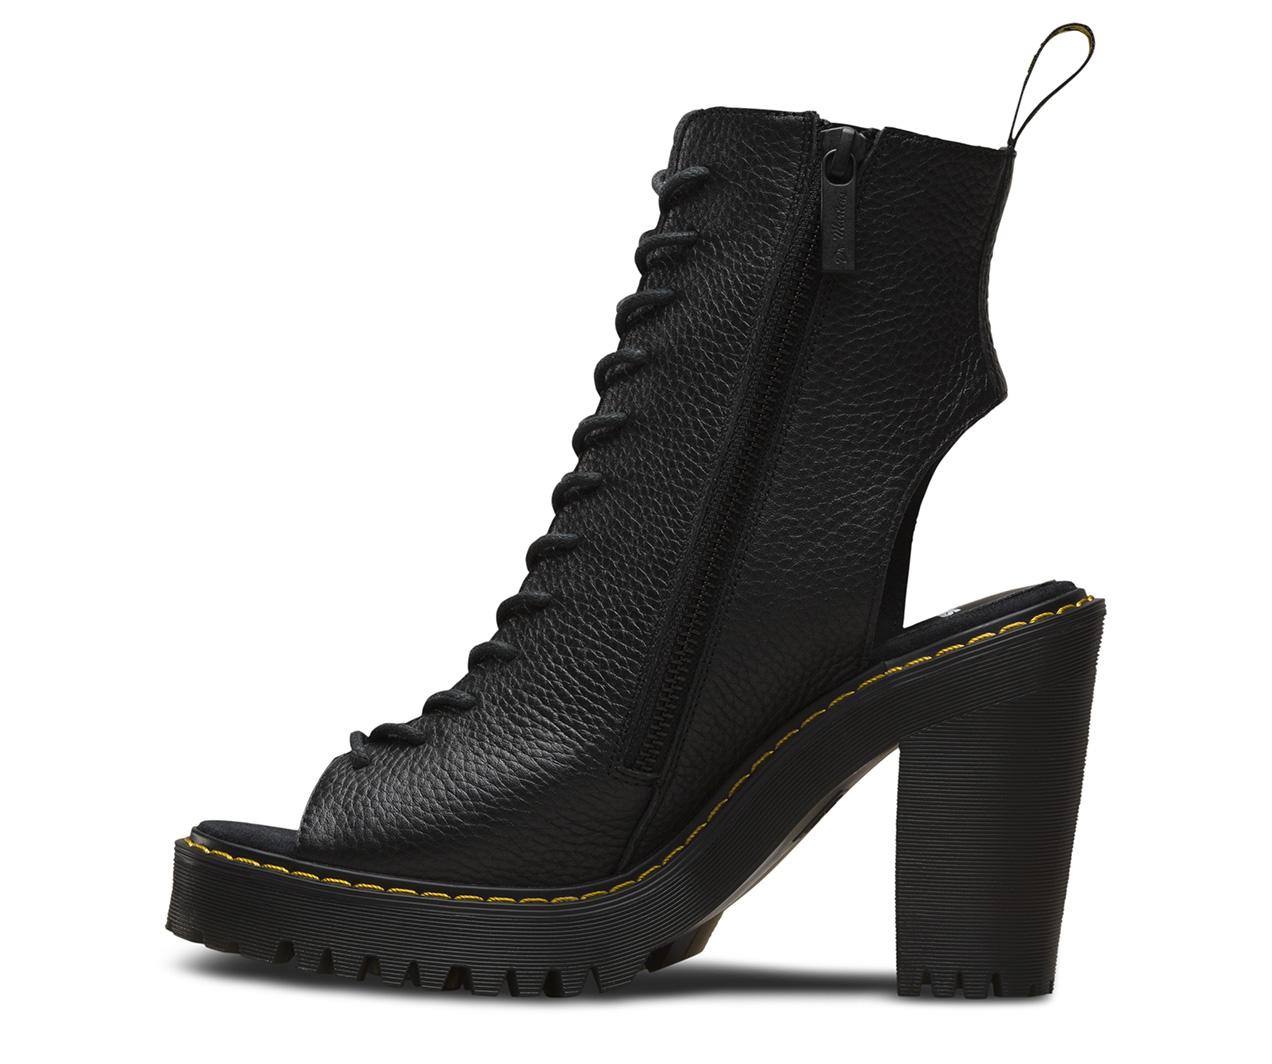 Dr. Martens CARMELITA women's Sandals in Visit 1mWHJ